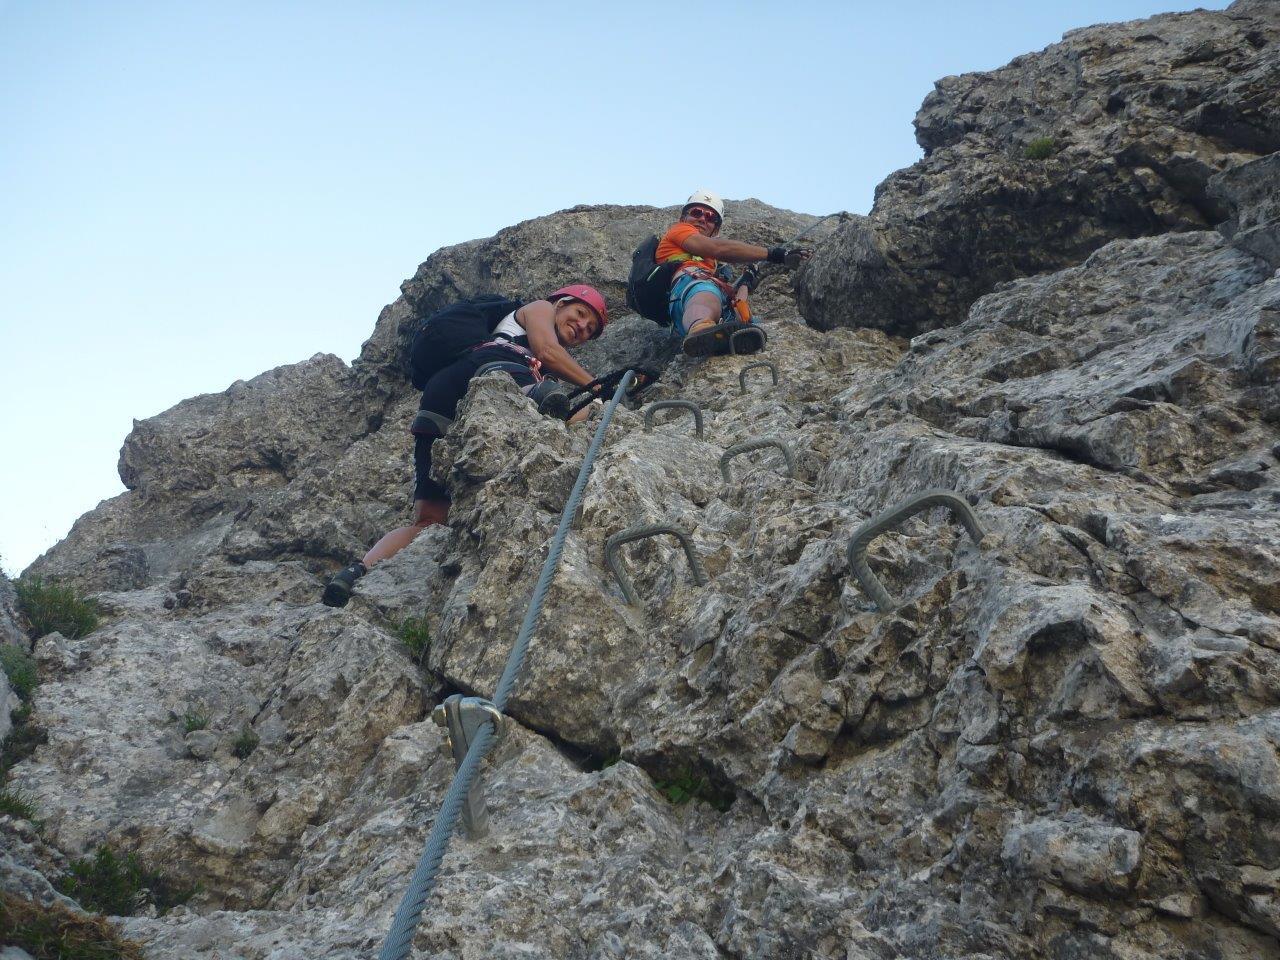 Klettersteig Däumling : Klettersteig däumling Österreichs wanderdörfer